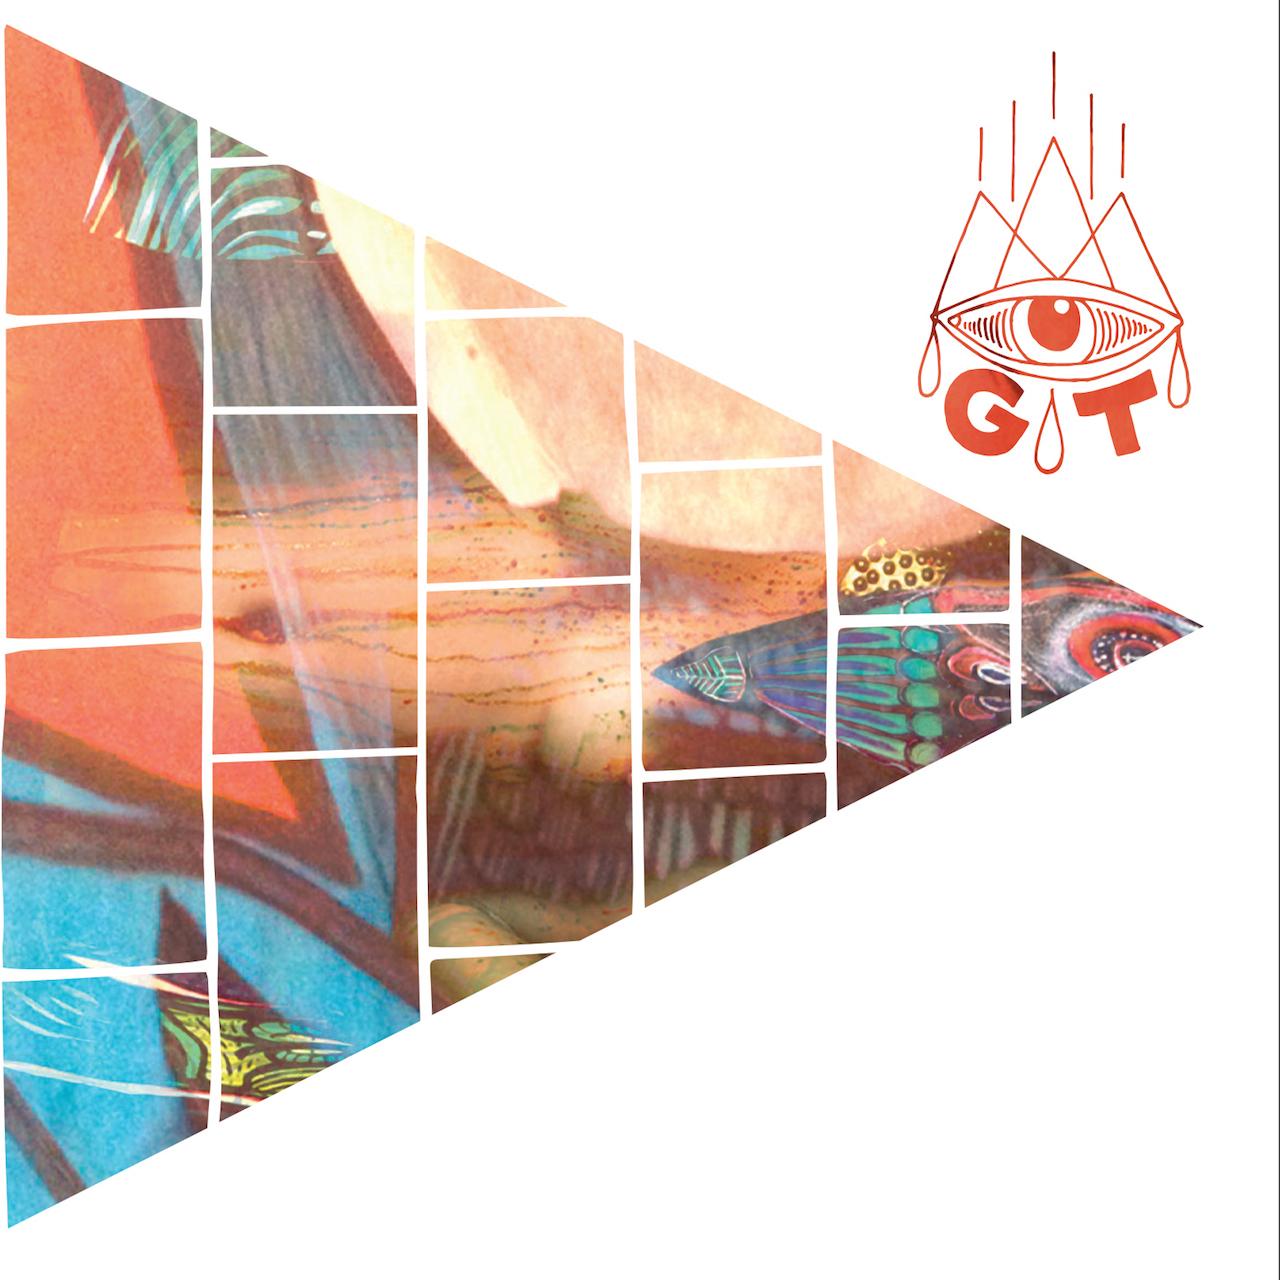 \\GT// beats misplaced